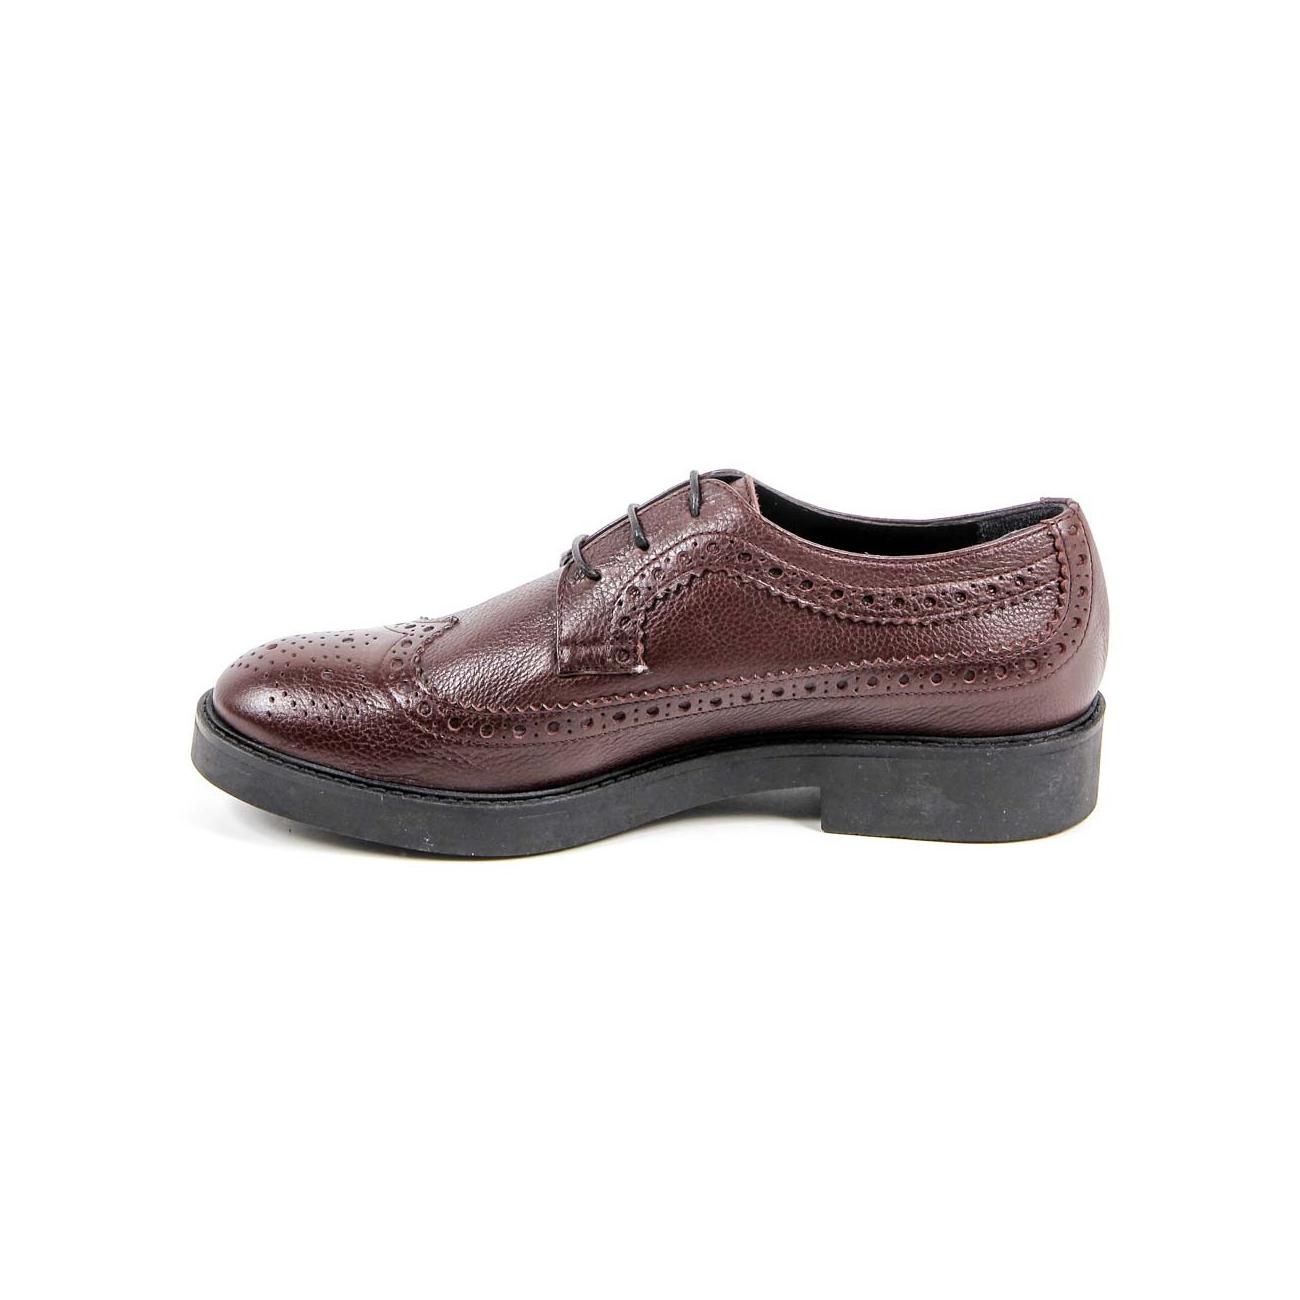 V 1969 Italia Womens Brogue Shoe B1670 CERVO BORDEAUX